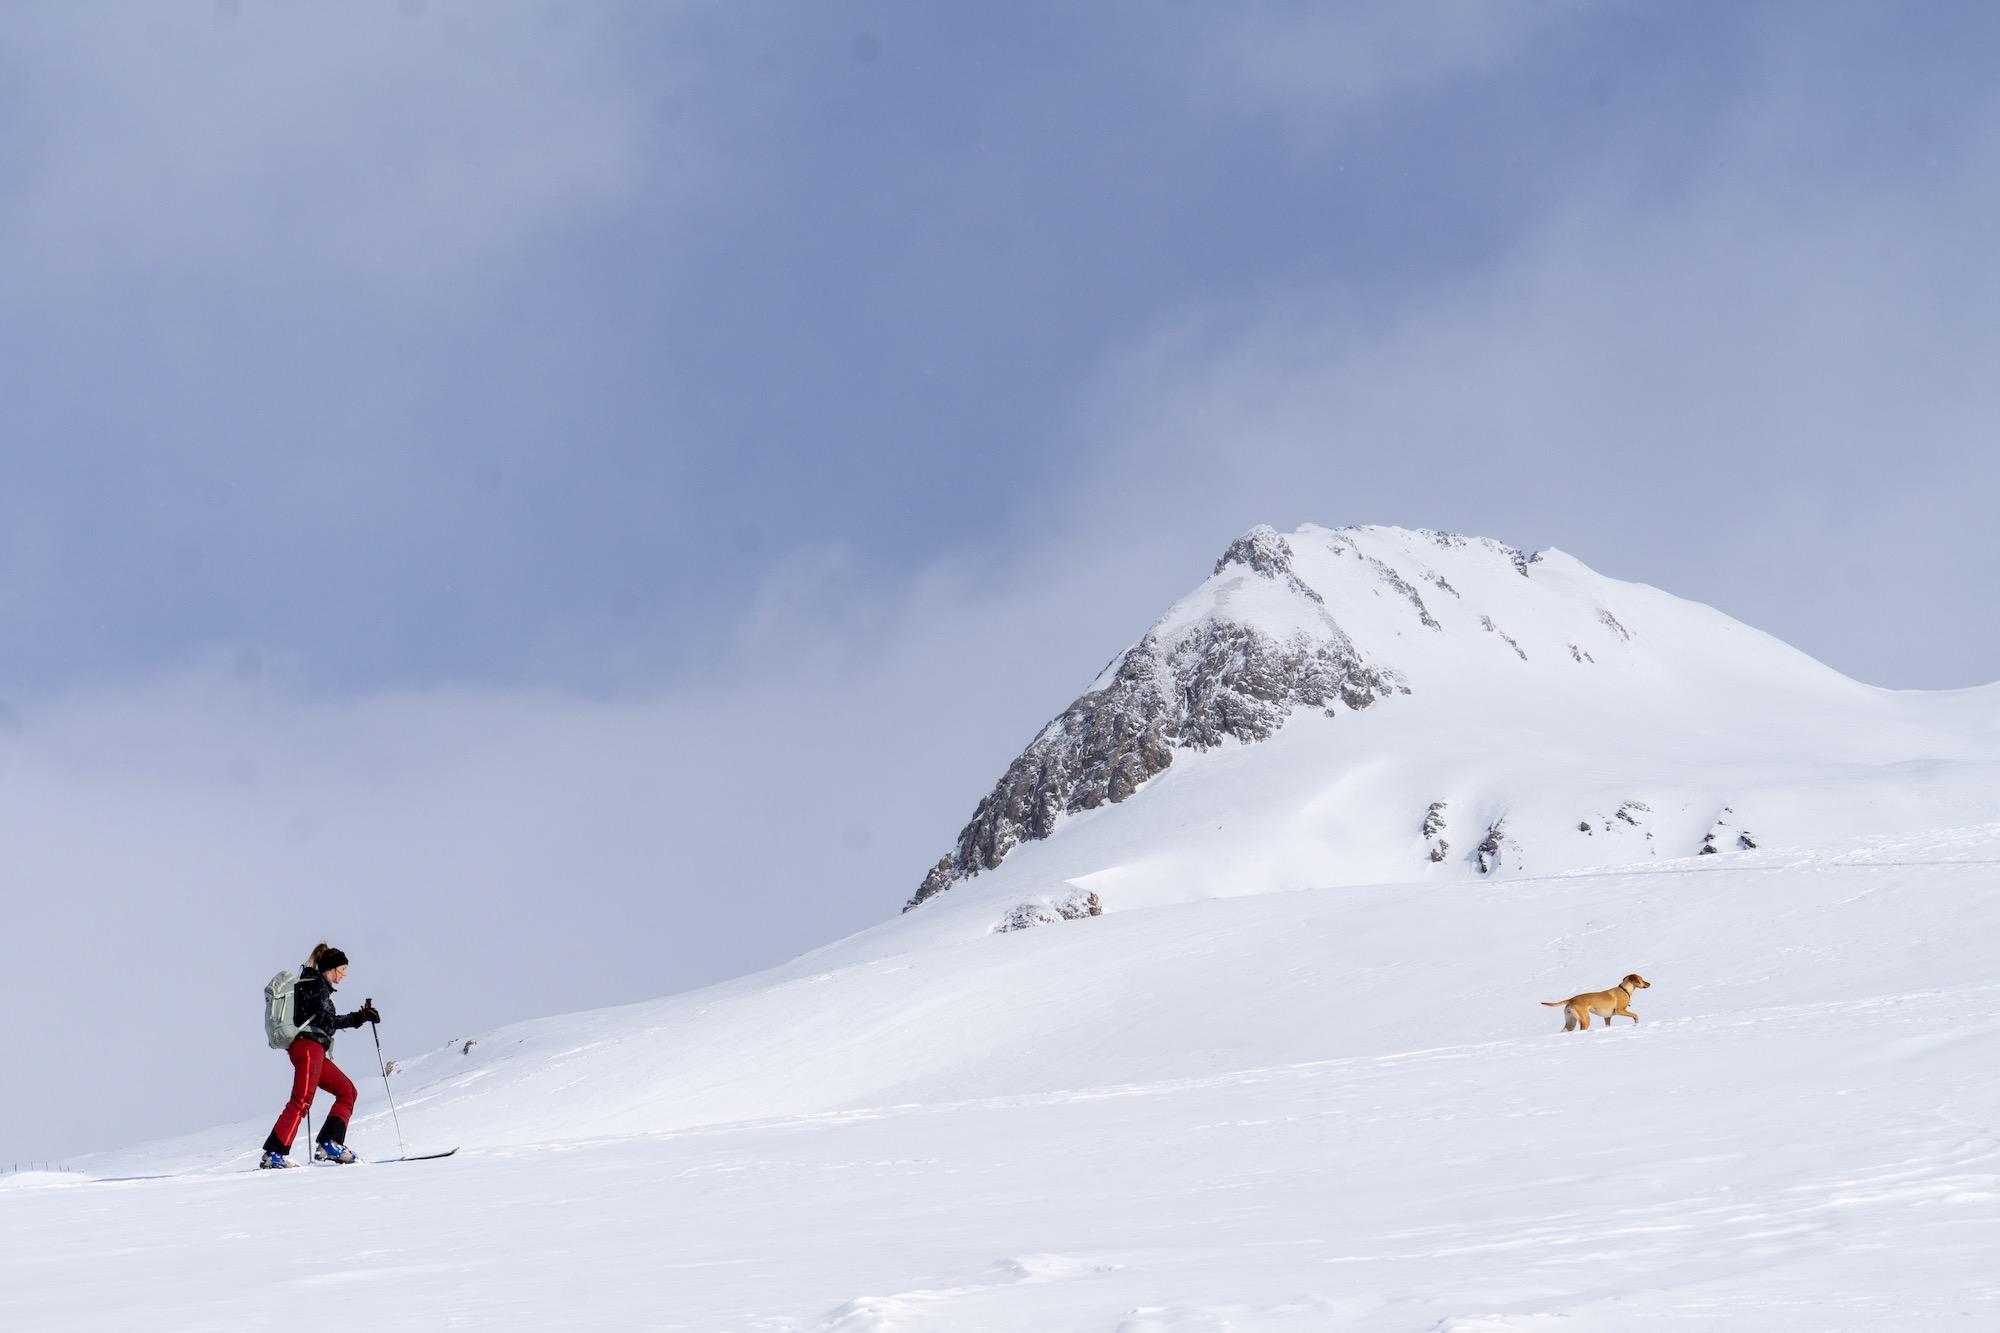 Ski Tour to Glorerhutte, Osttirol, Austria